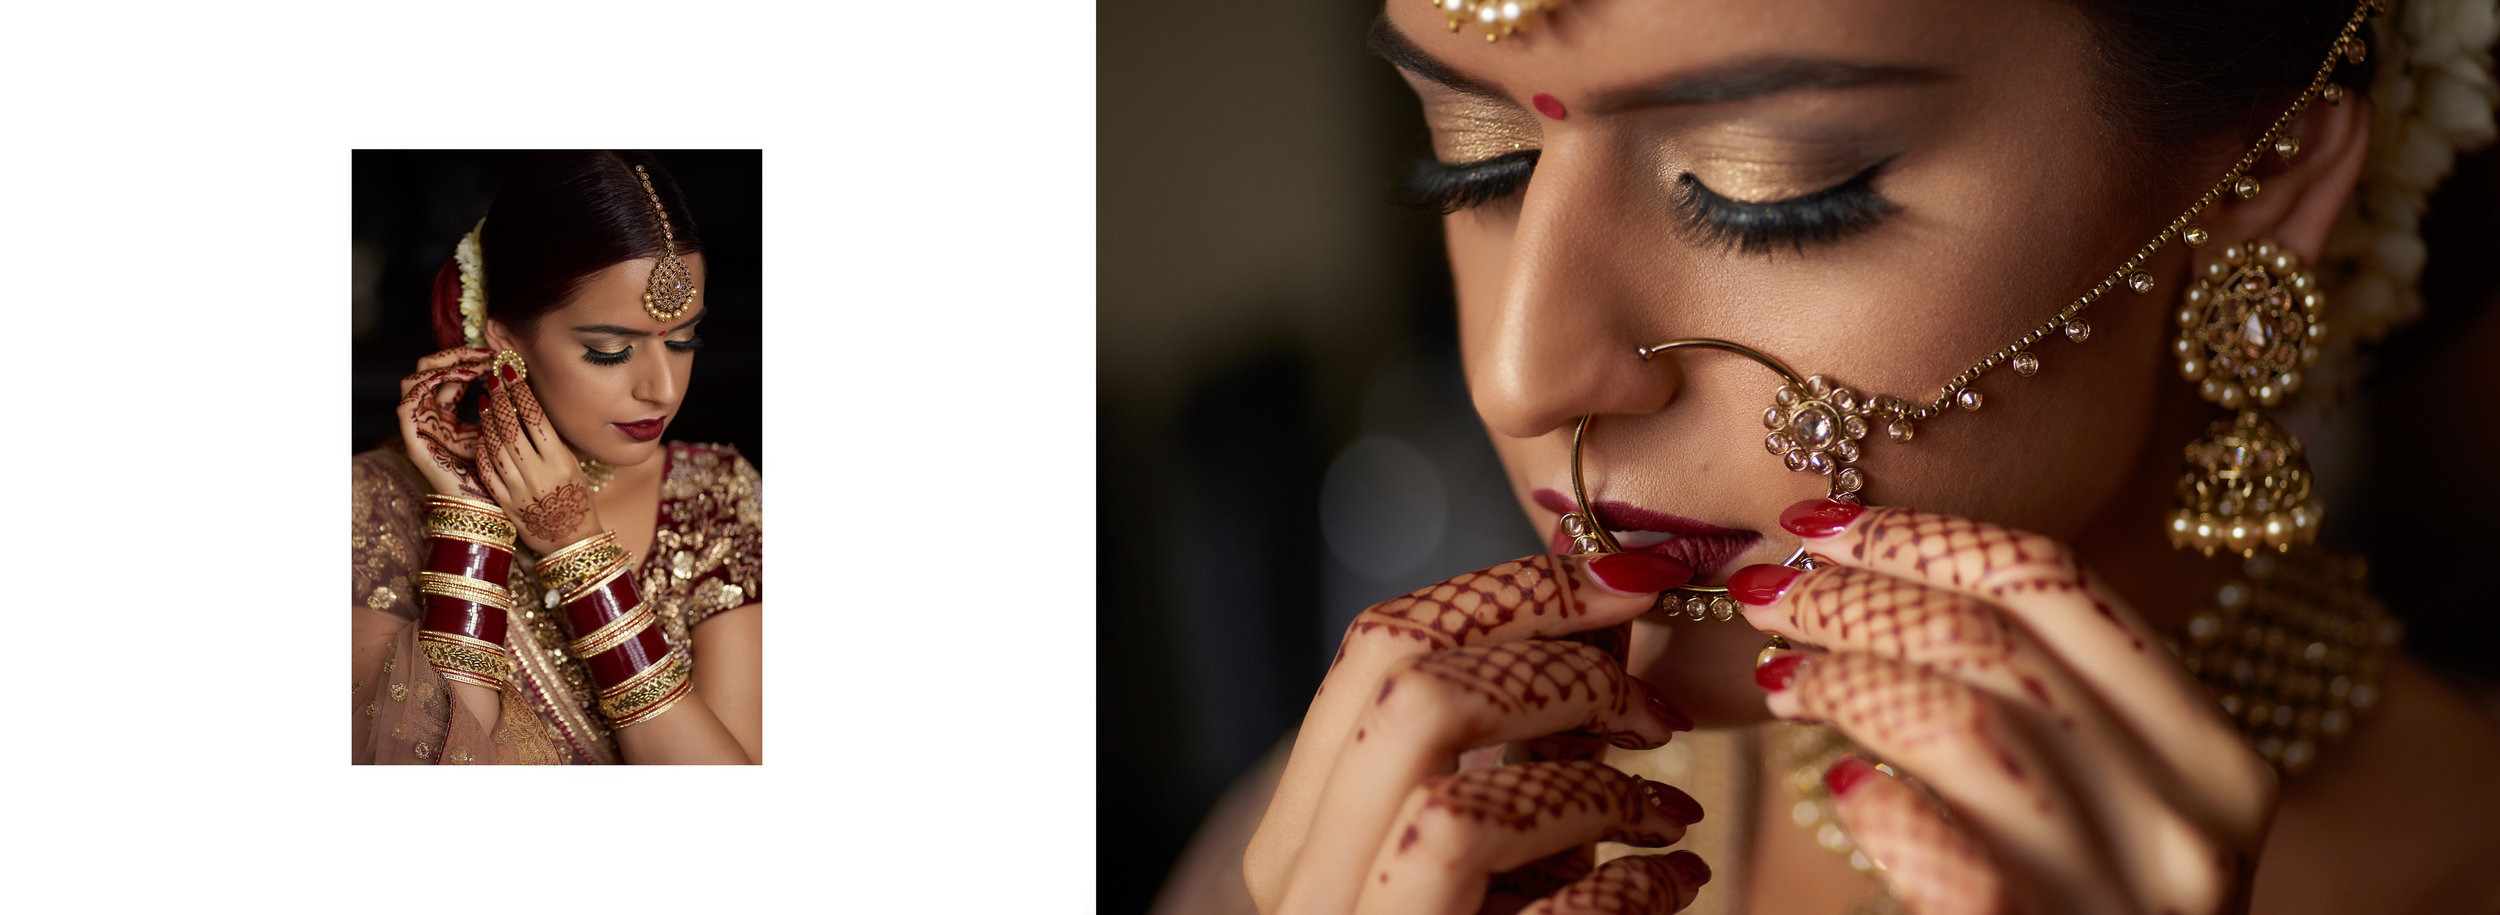 Sikh Wedding Album spread 7 - bride putting on jewellery